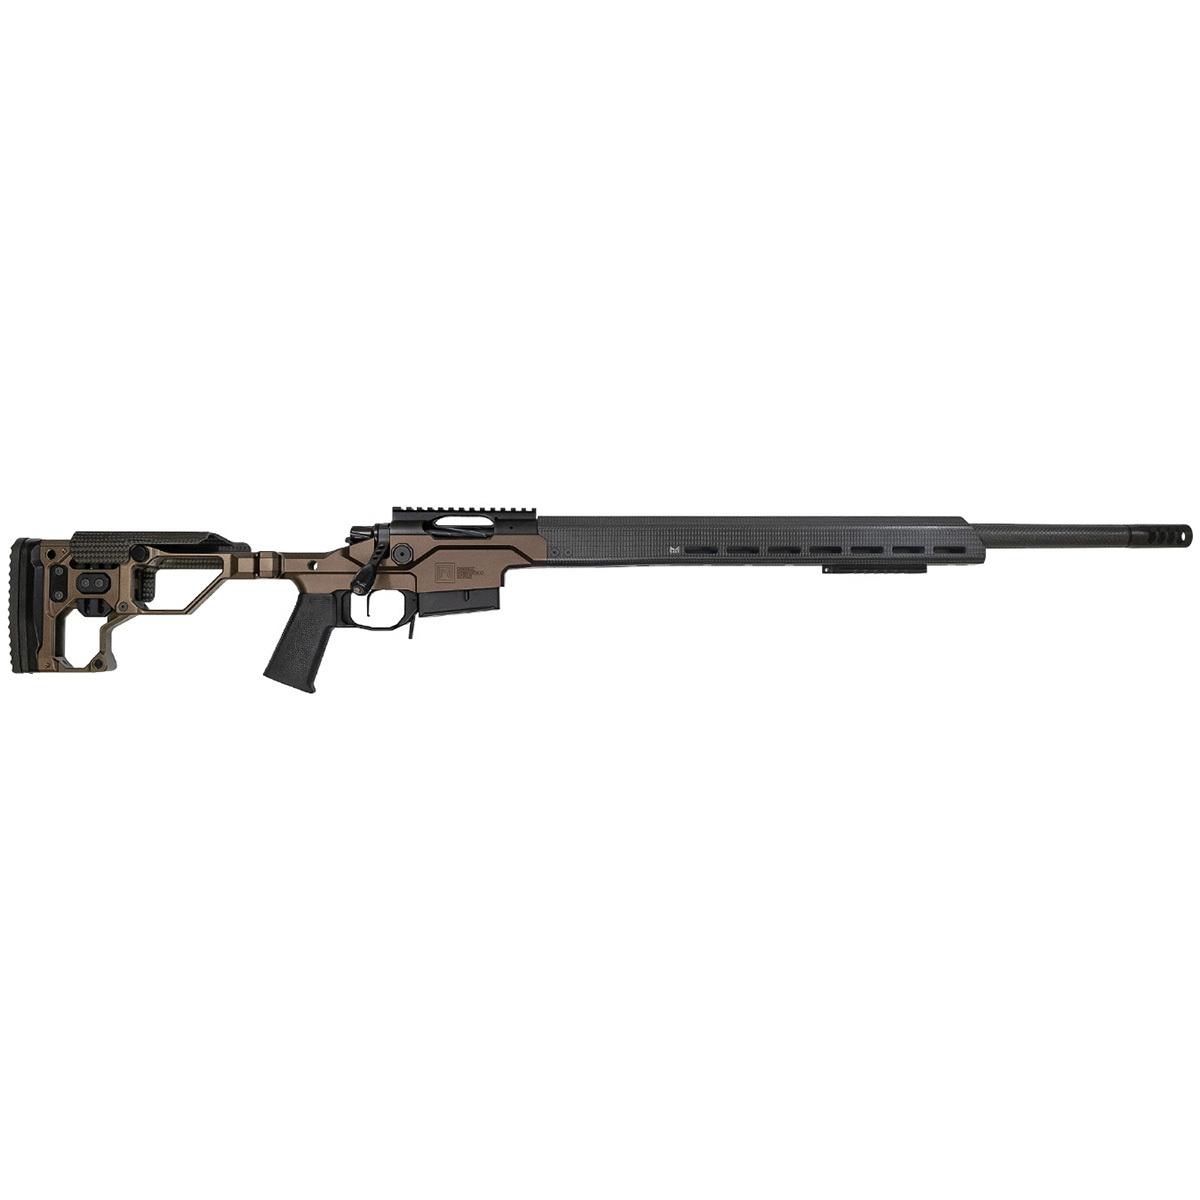 Christensen Arms MPR 338LM Desert Brown Stainless Steel Barrel